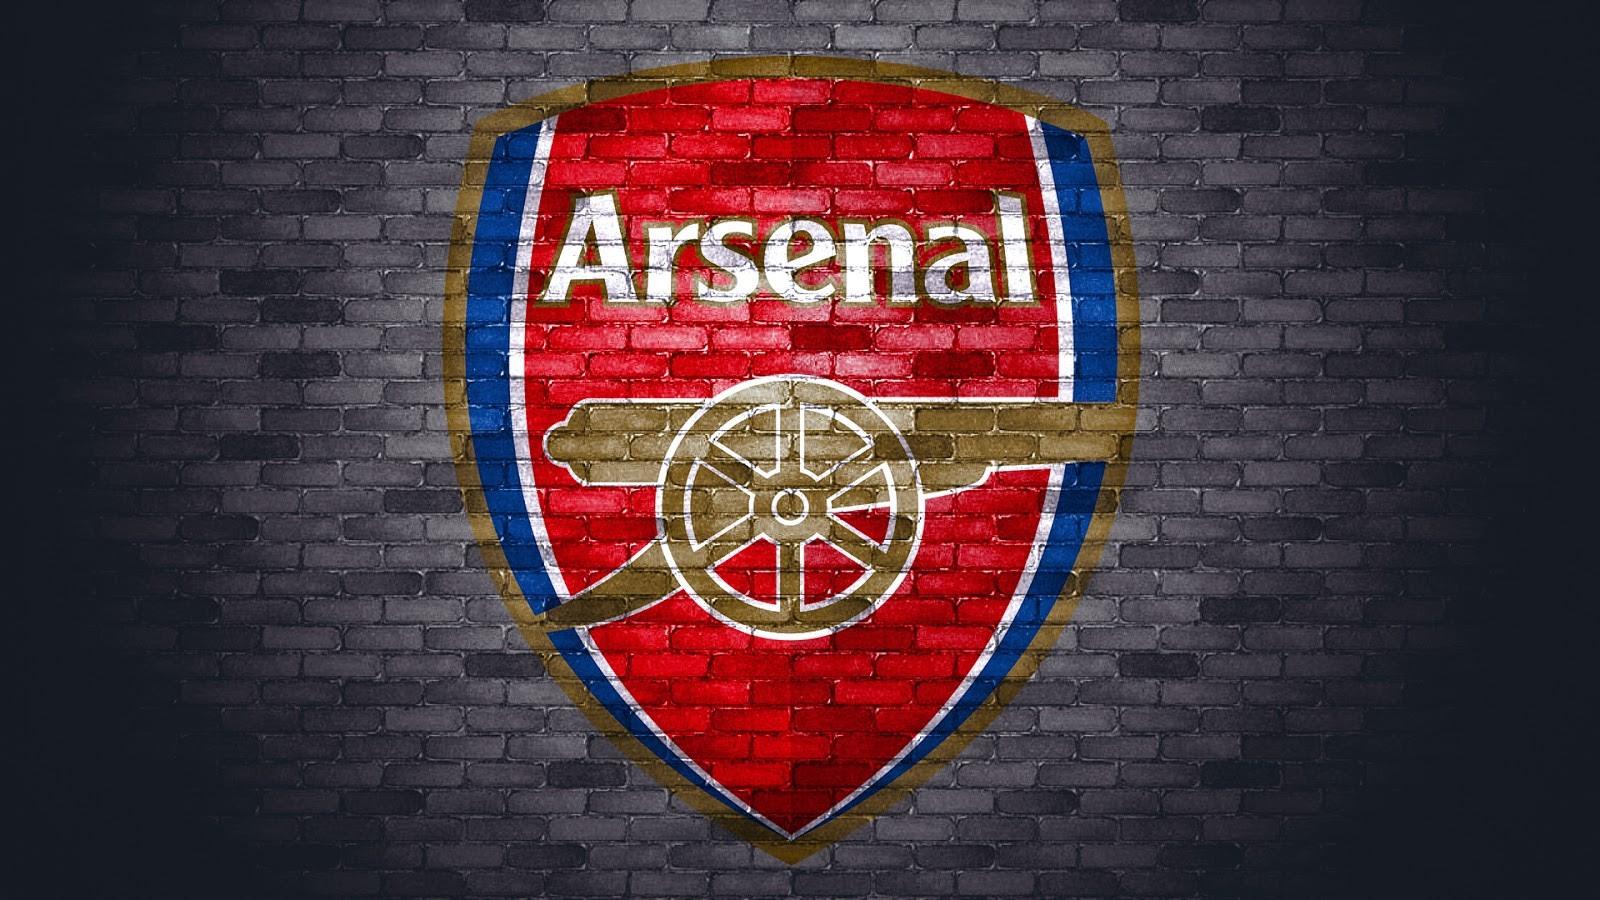 Arsenal FC HD Background Wallpapers 32138 - Baltana